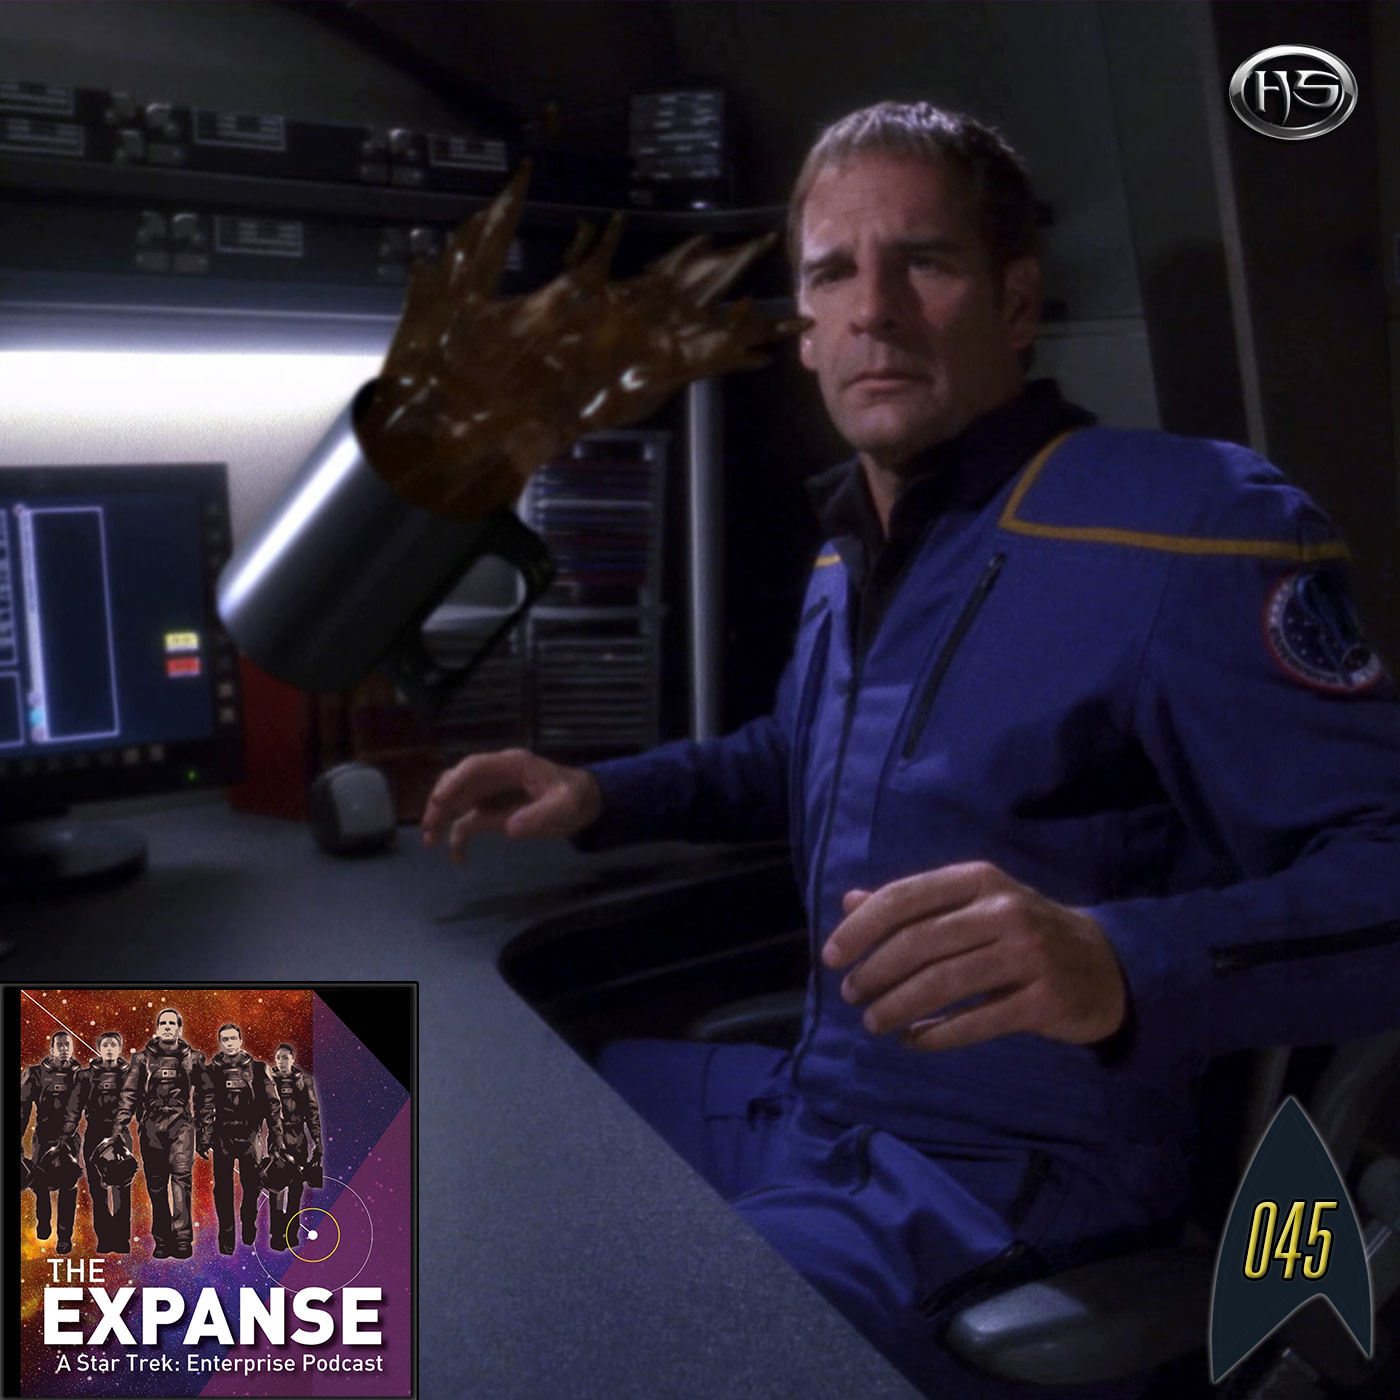 The Expanse Episode 45